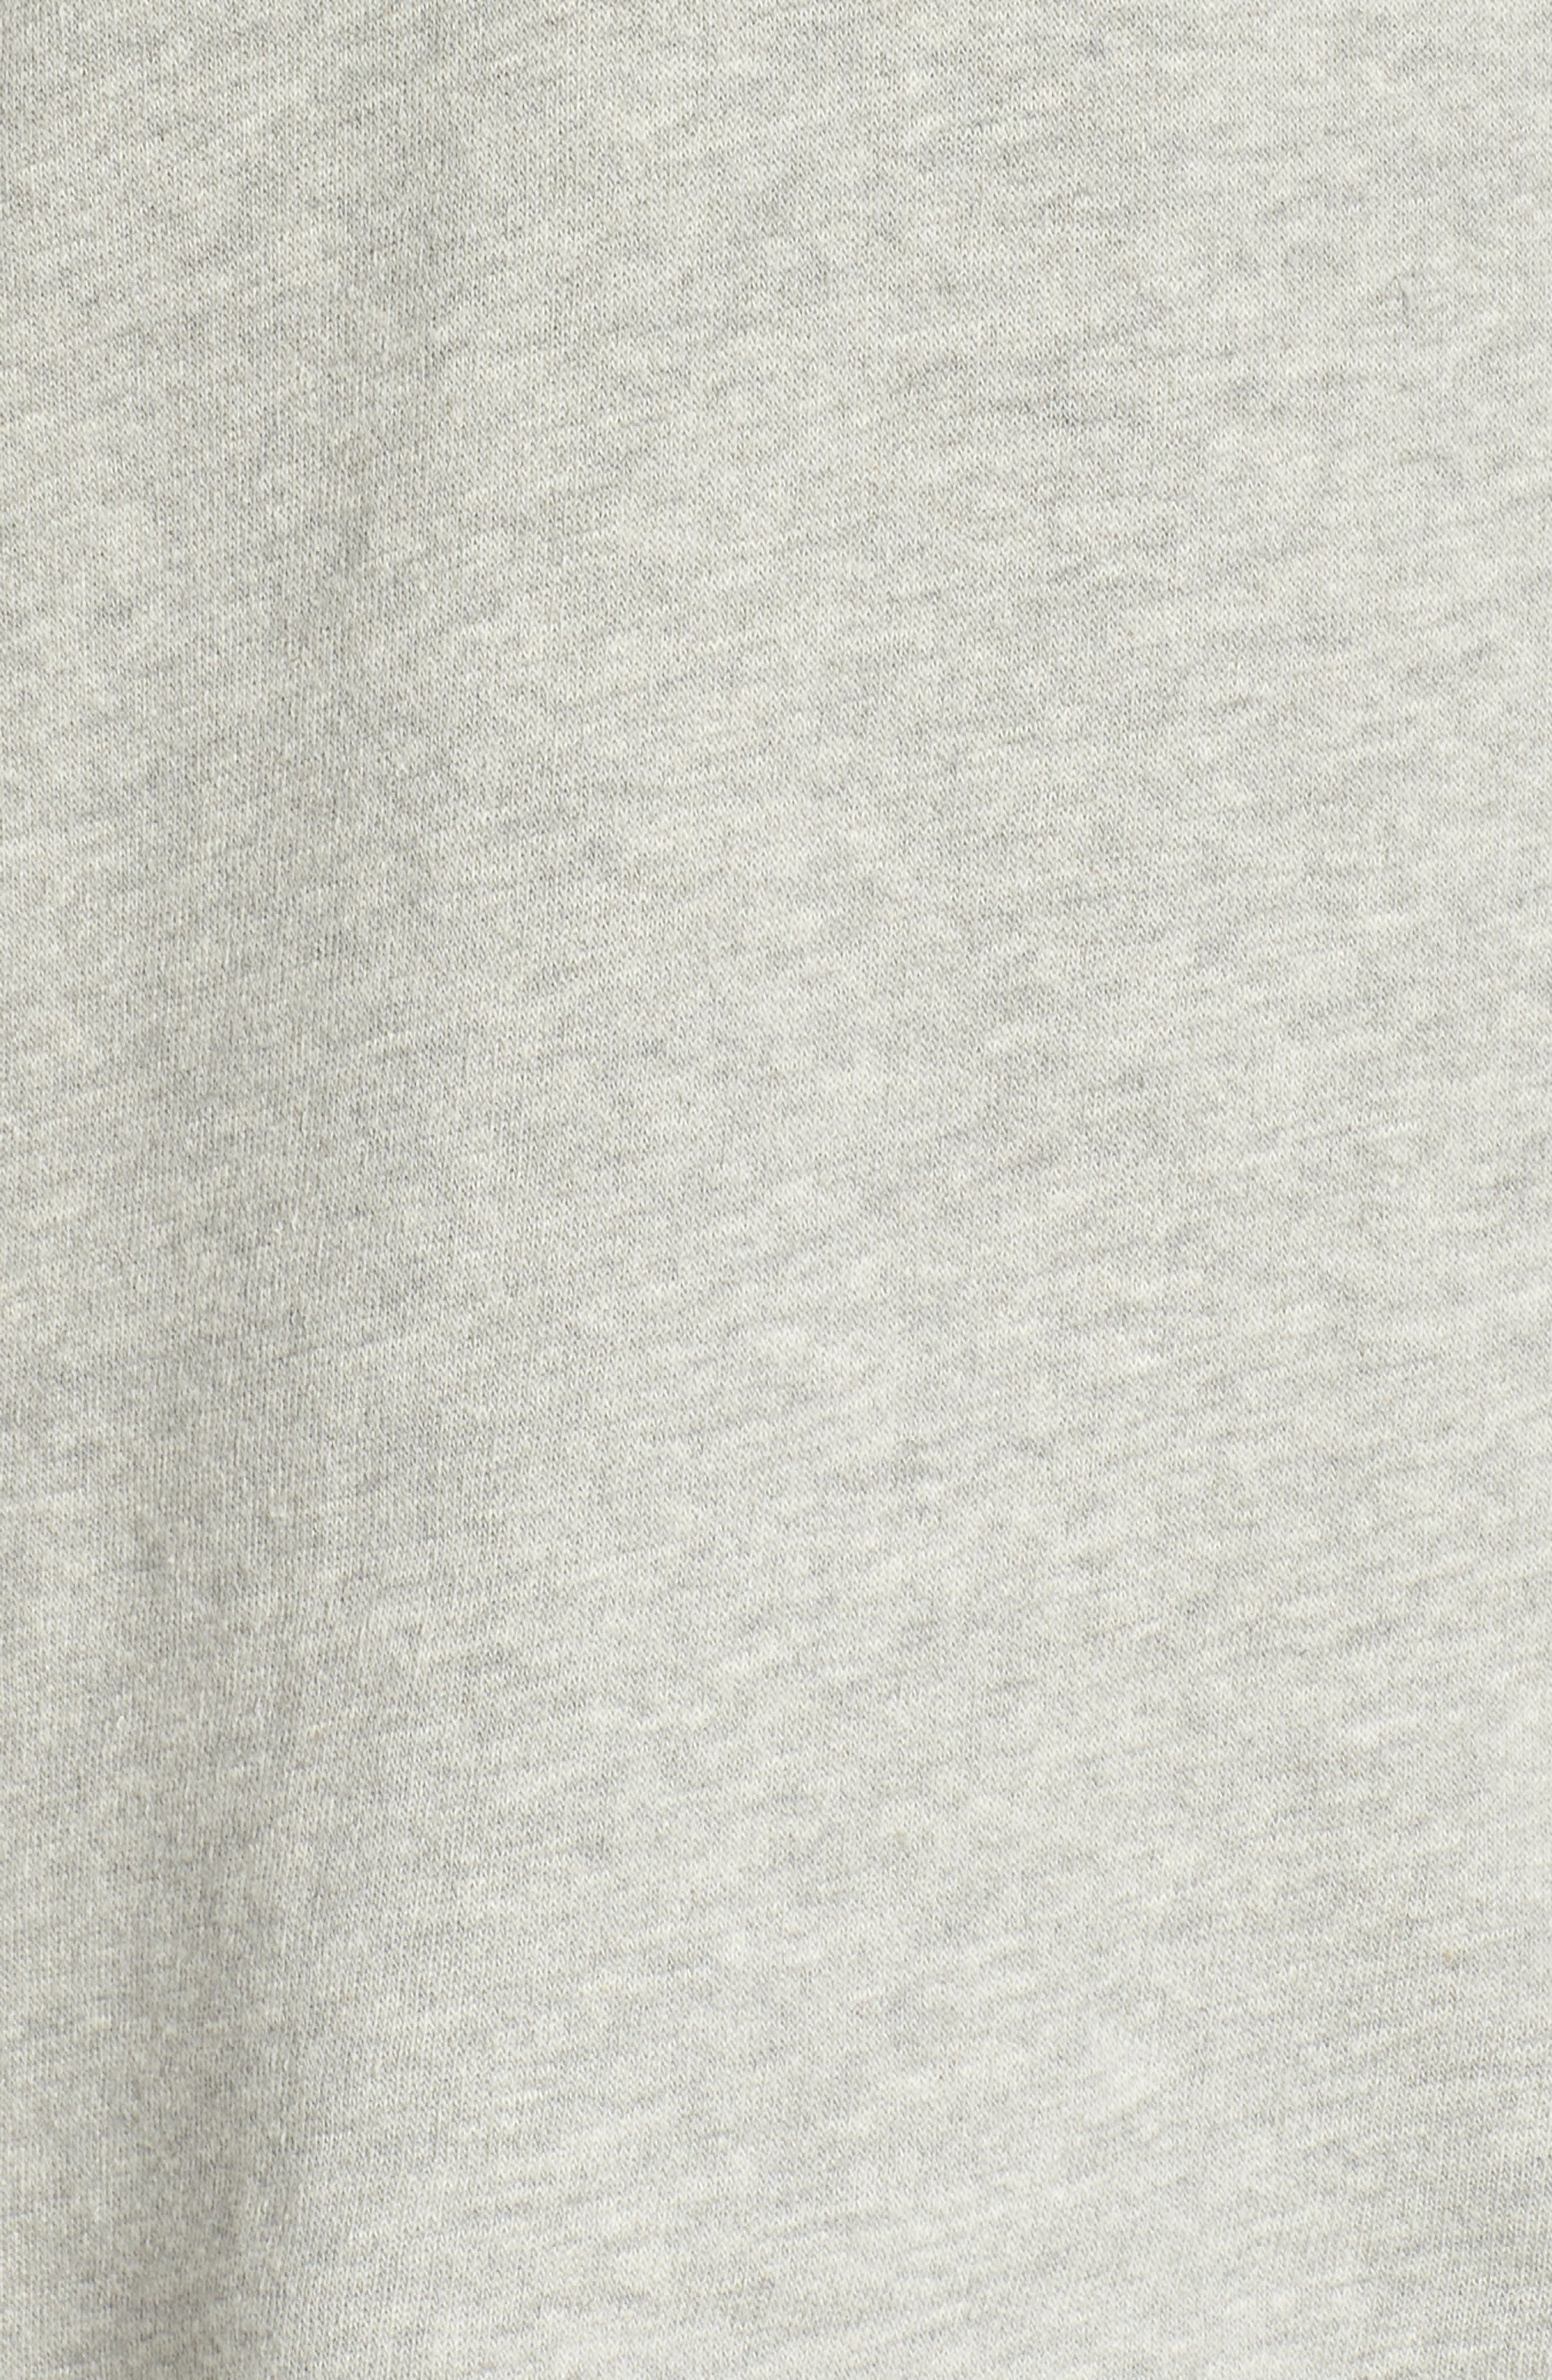 Edwardo Bell Sleeve Hoodie,                             Alternate thumbnail 7, color,                             Heather Grey